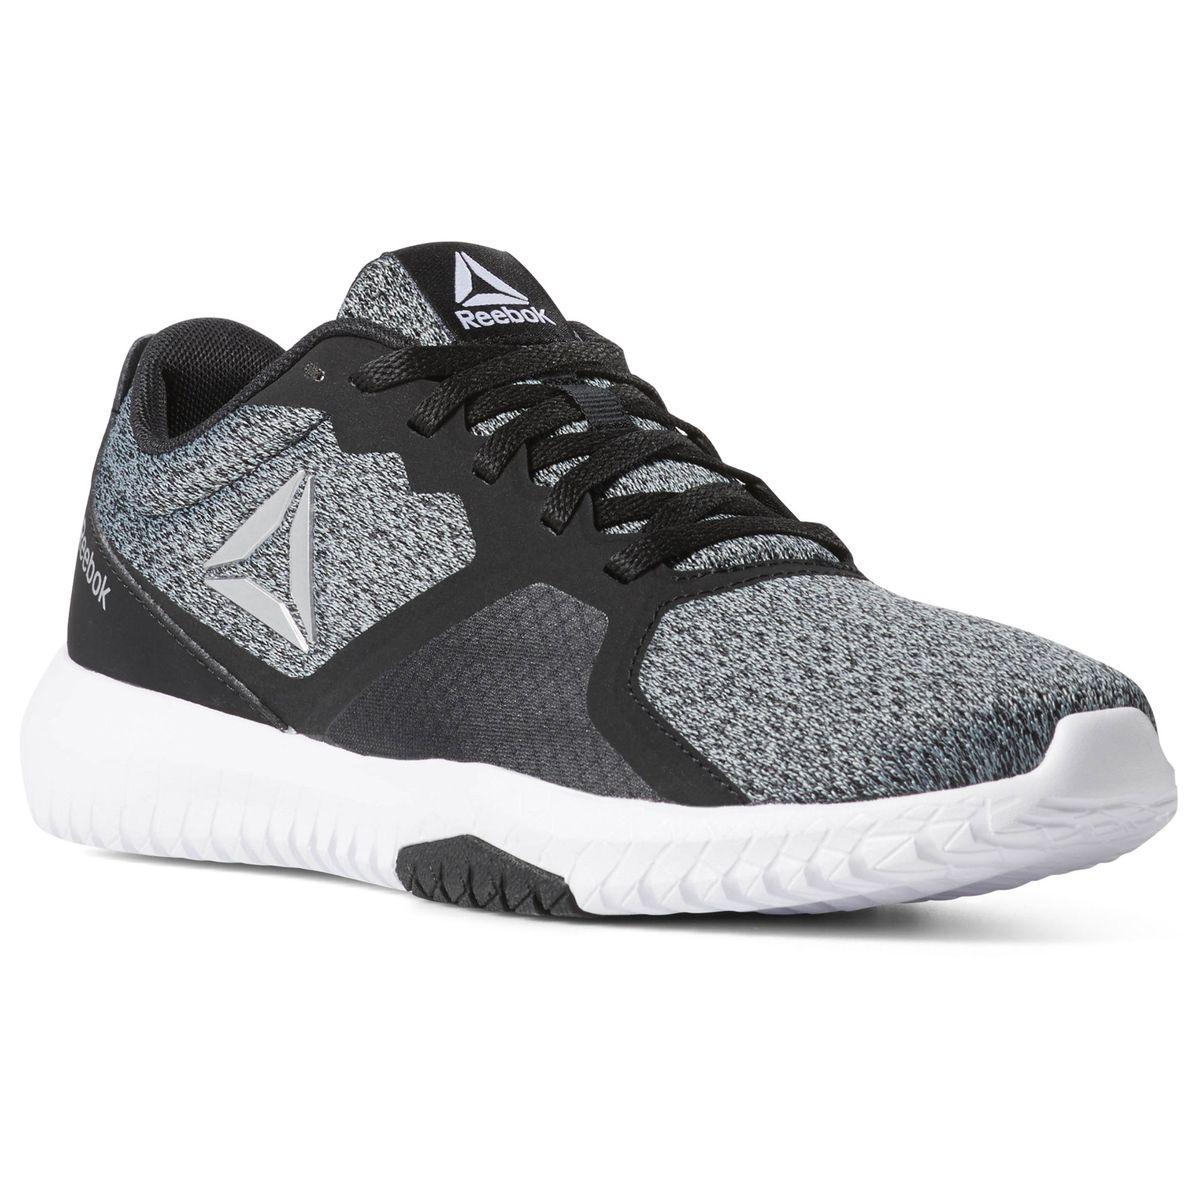 reebok women's flexagon force d shoes